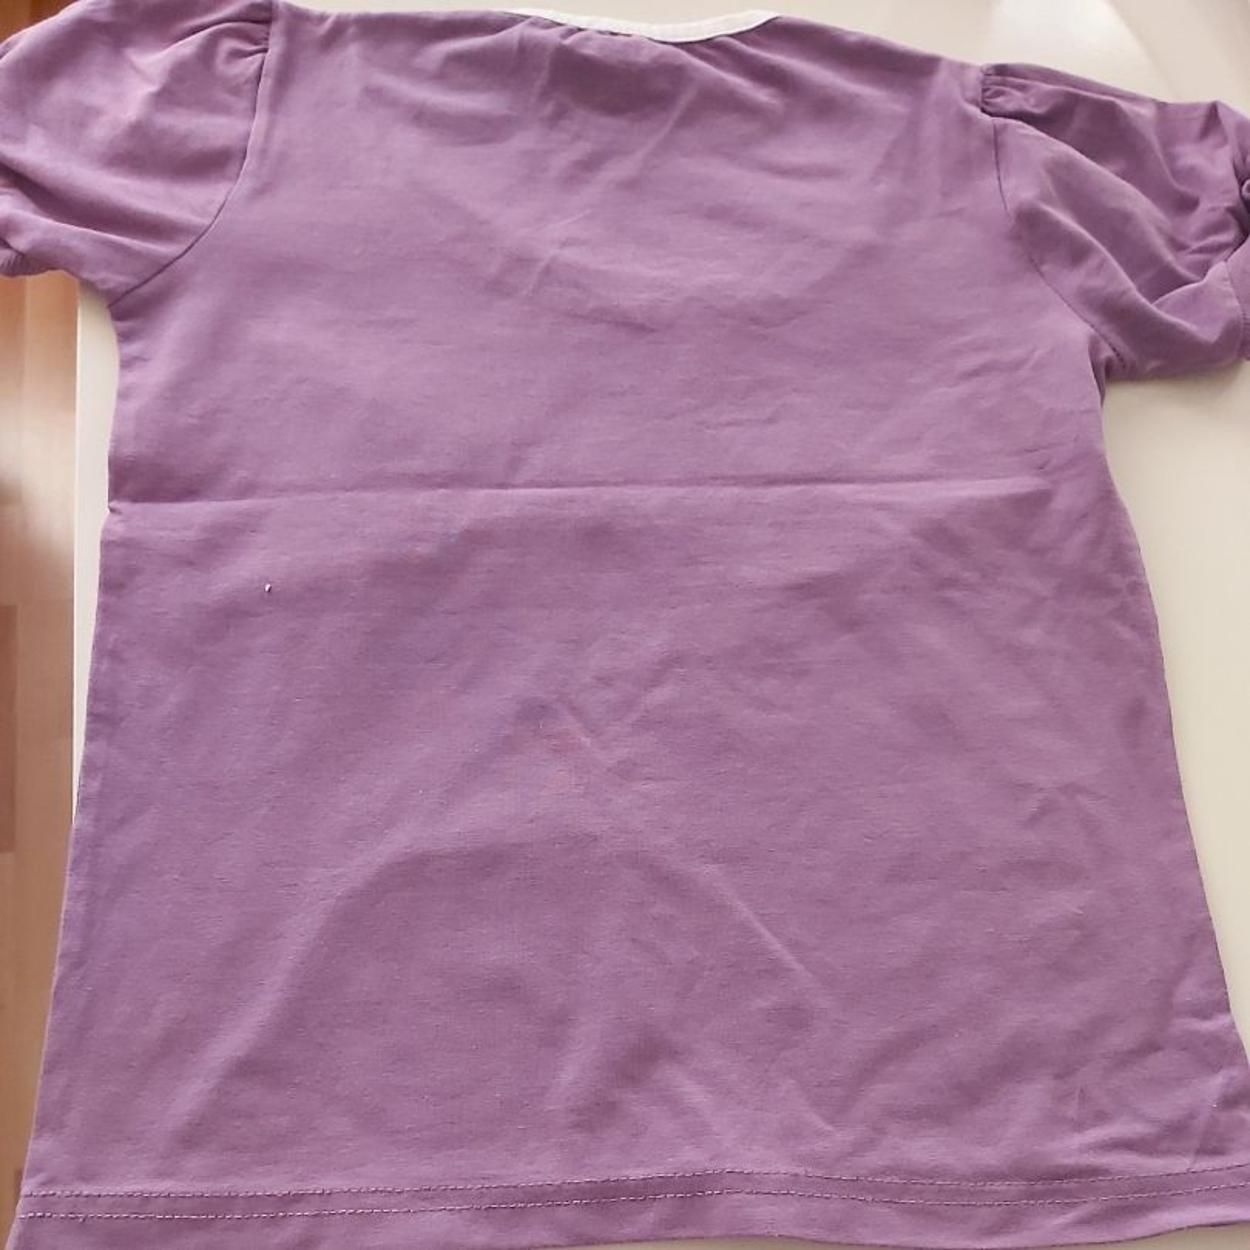 Hooyo Tshirt & Body